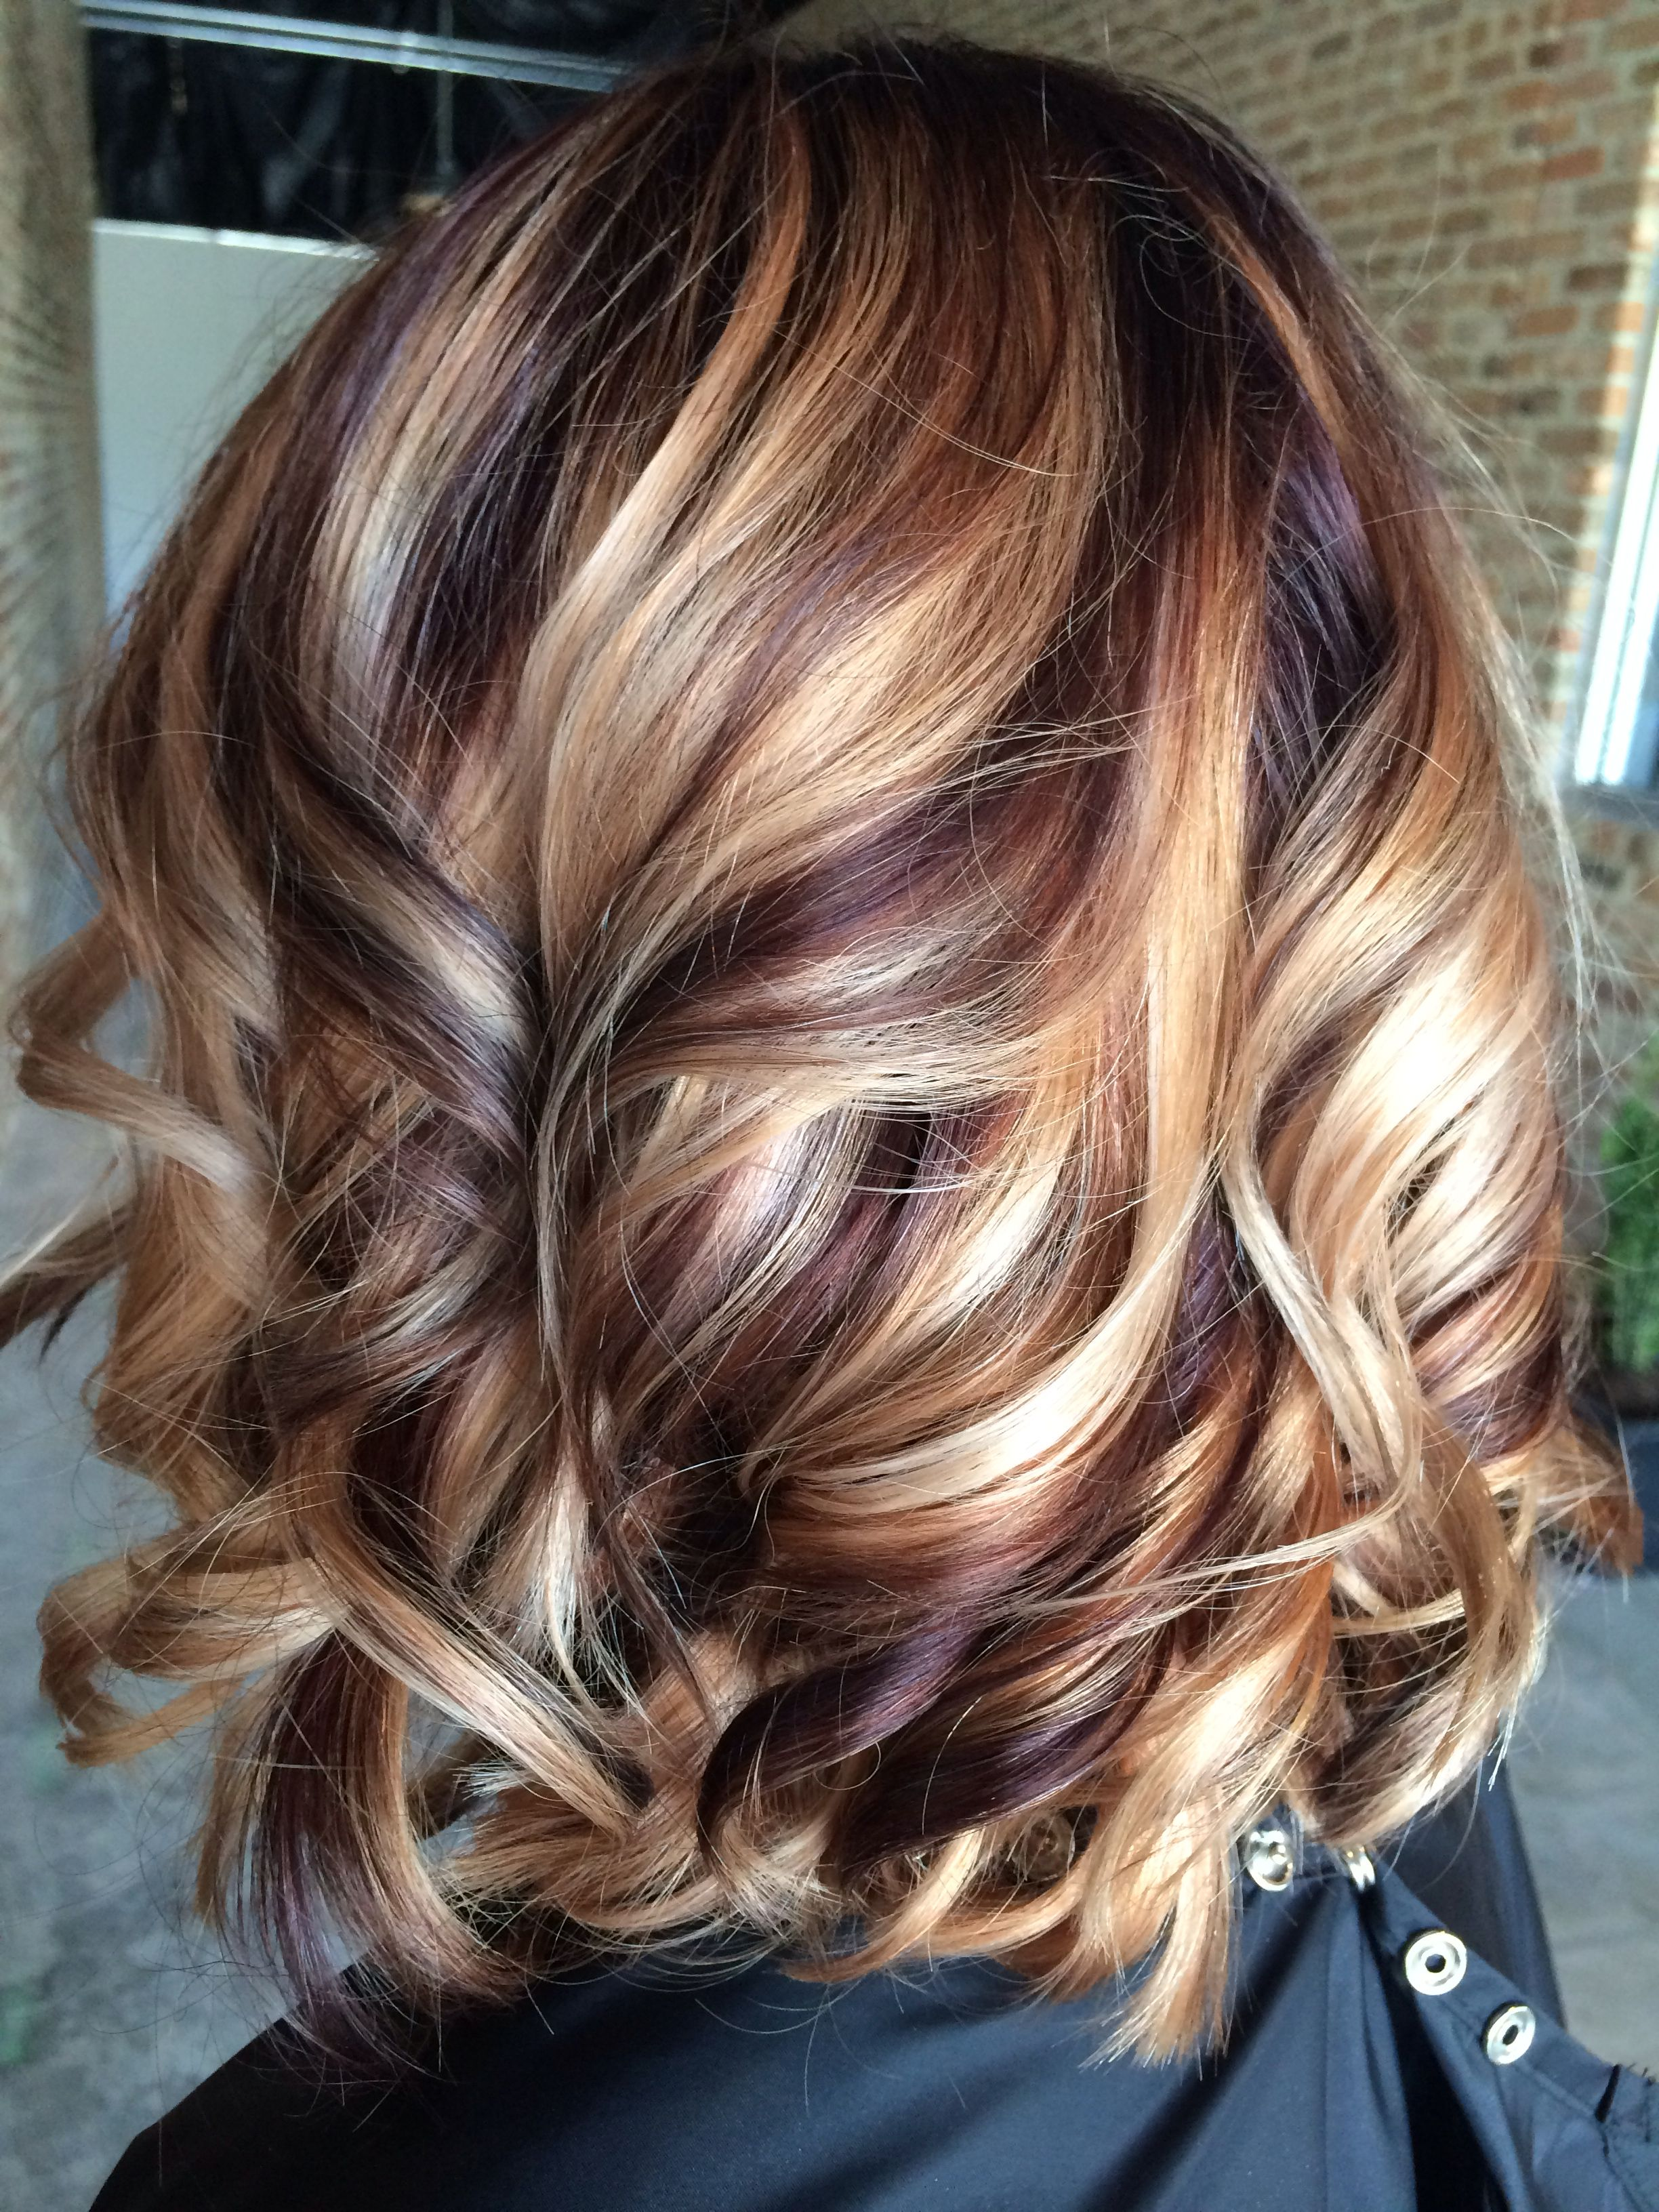 15 Pretty Hairstyles For Medium Length Hair Popular Haircuts Hair Styles Long Hair Styles Medium Hair Styles